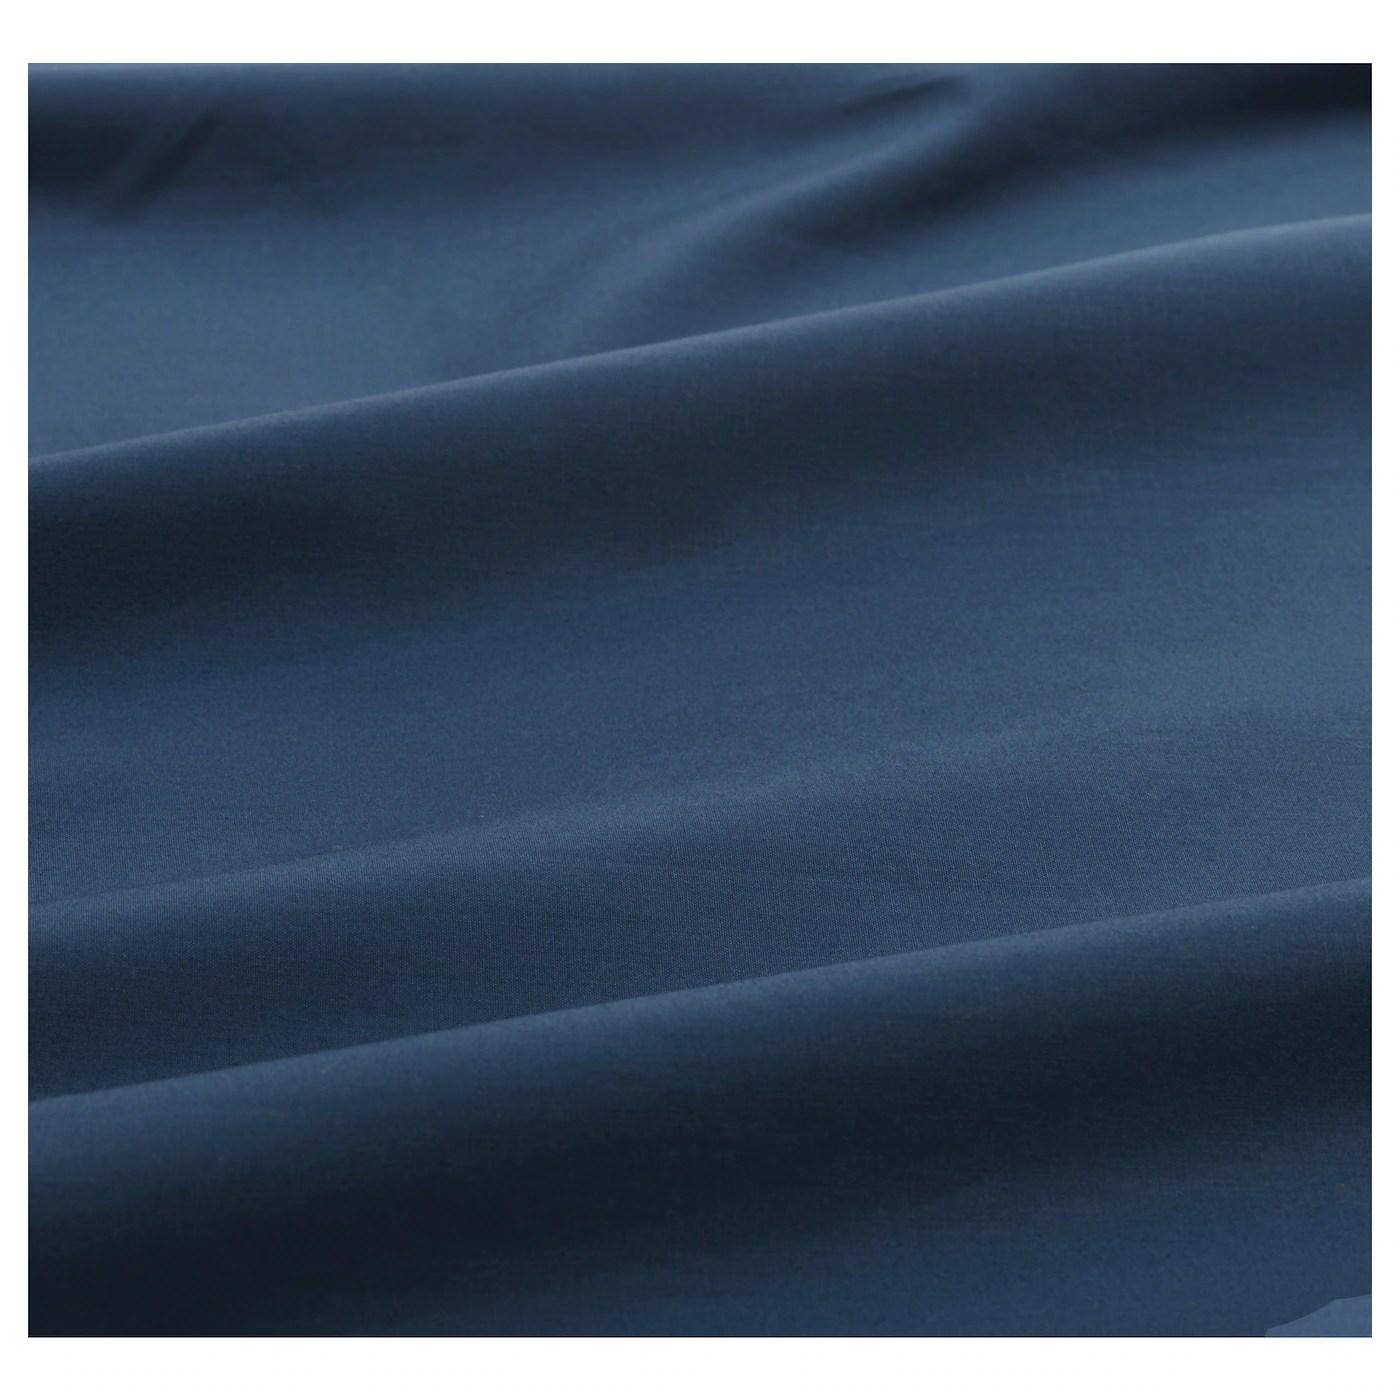 Ullvide Drap Housse Bleu Fonce 140x200 Cm Ikea